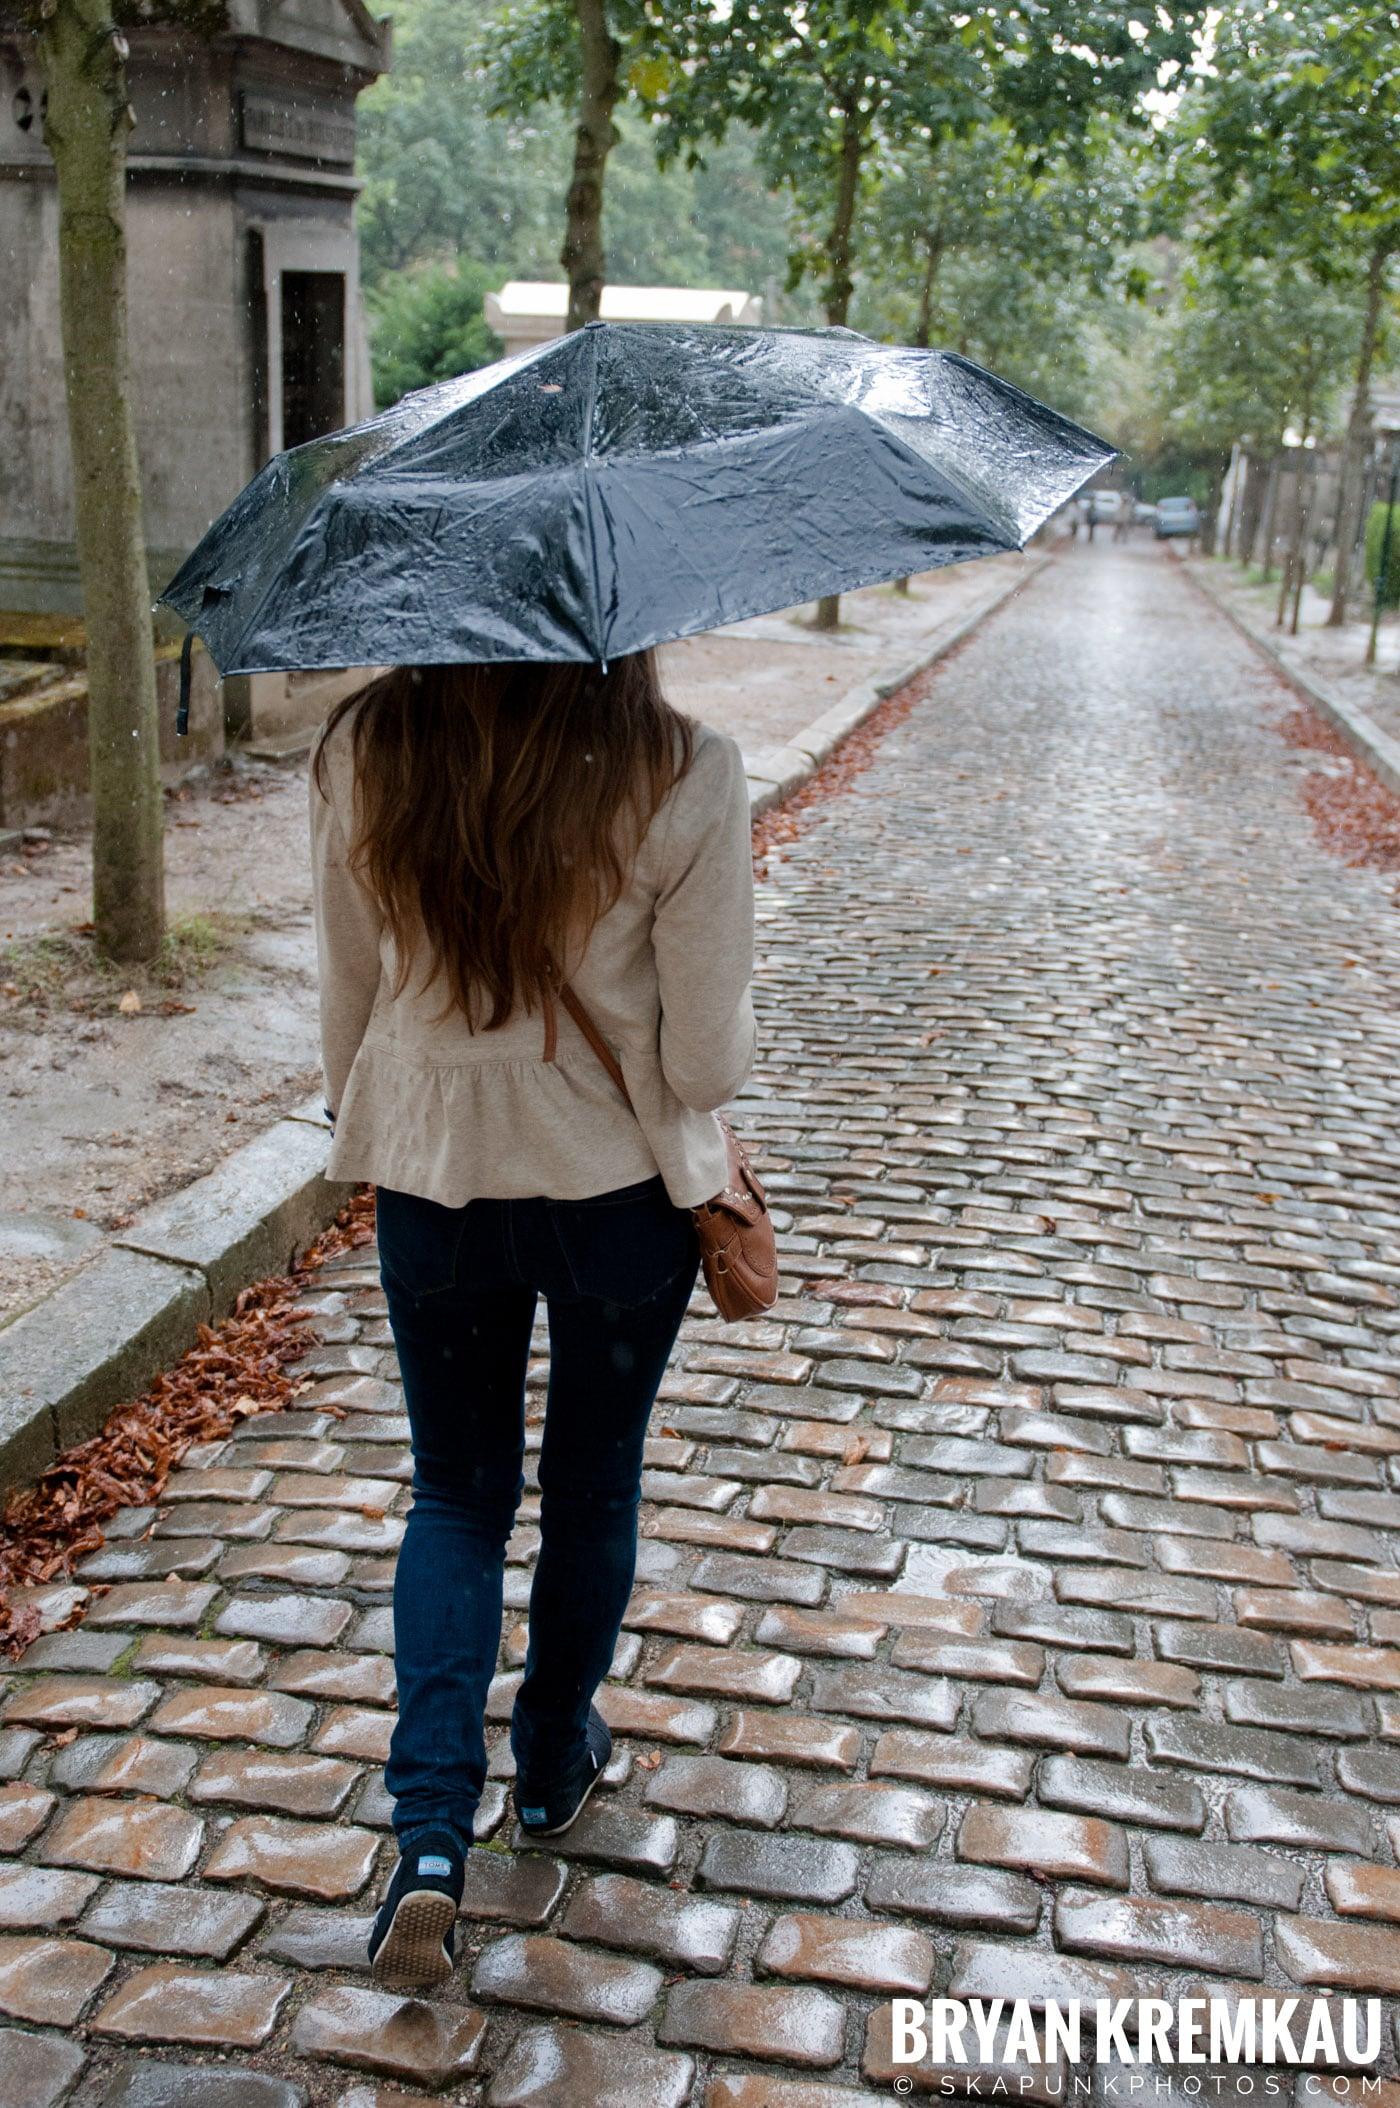 Paris, France Honeymoon - Day 5 - 7.22.11 (23)